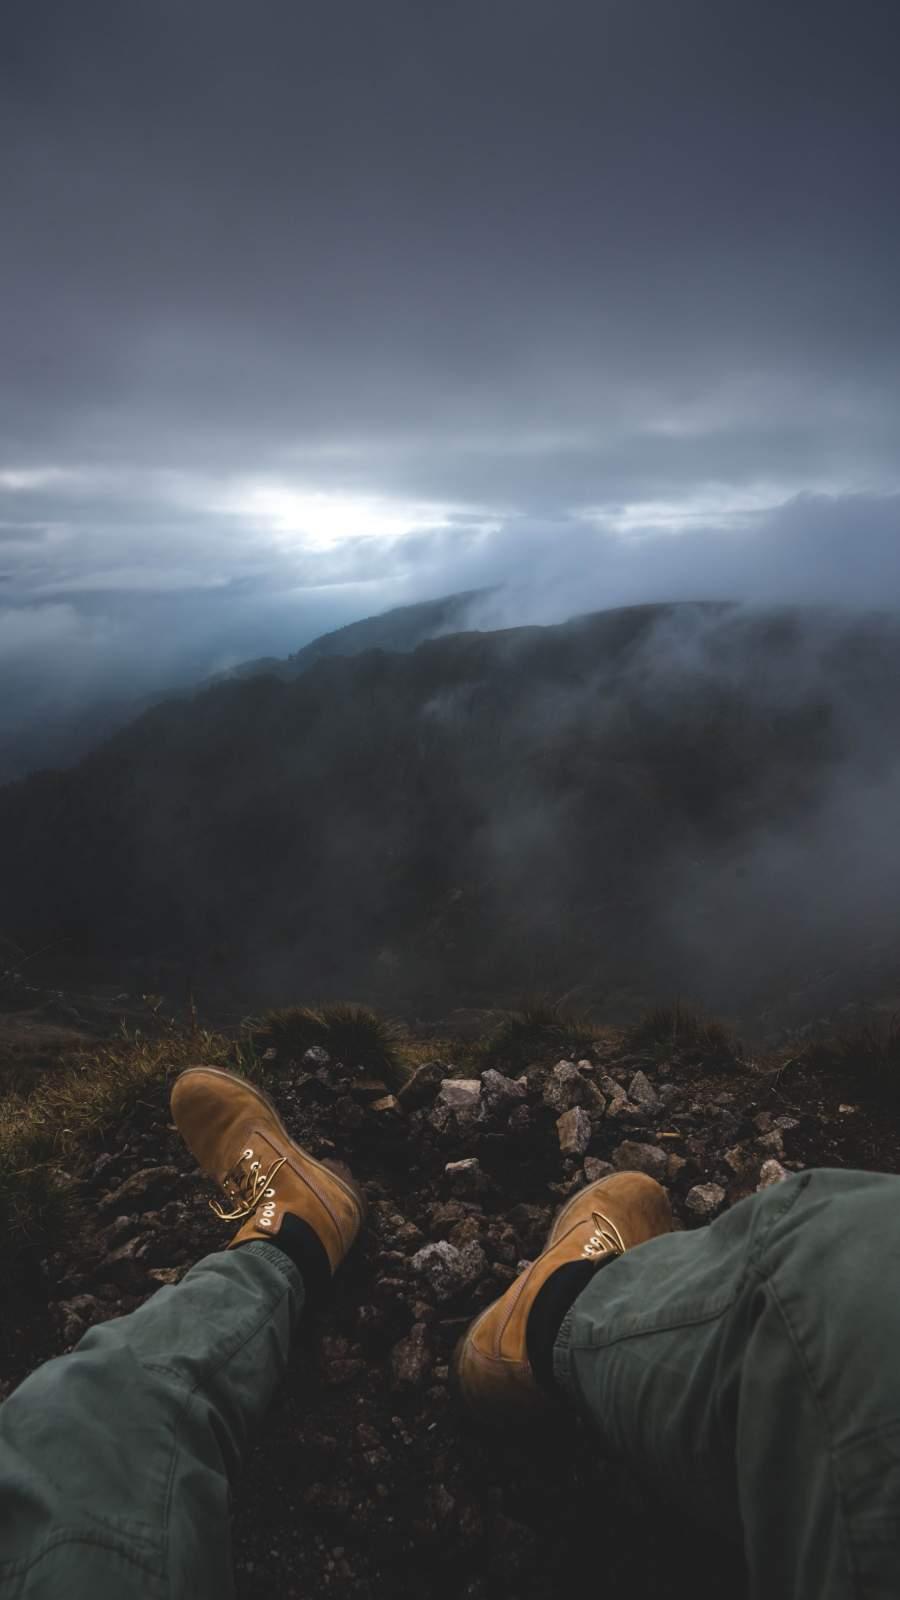 Mountain Adventure iPhone Wallpaper